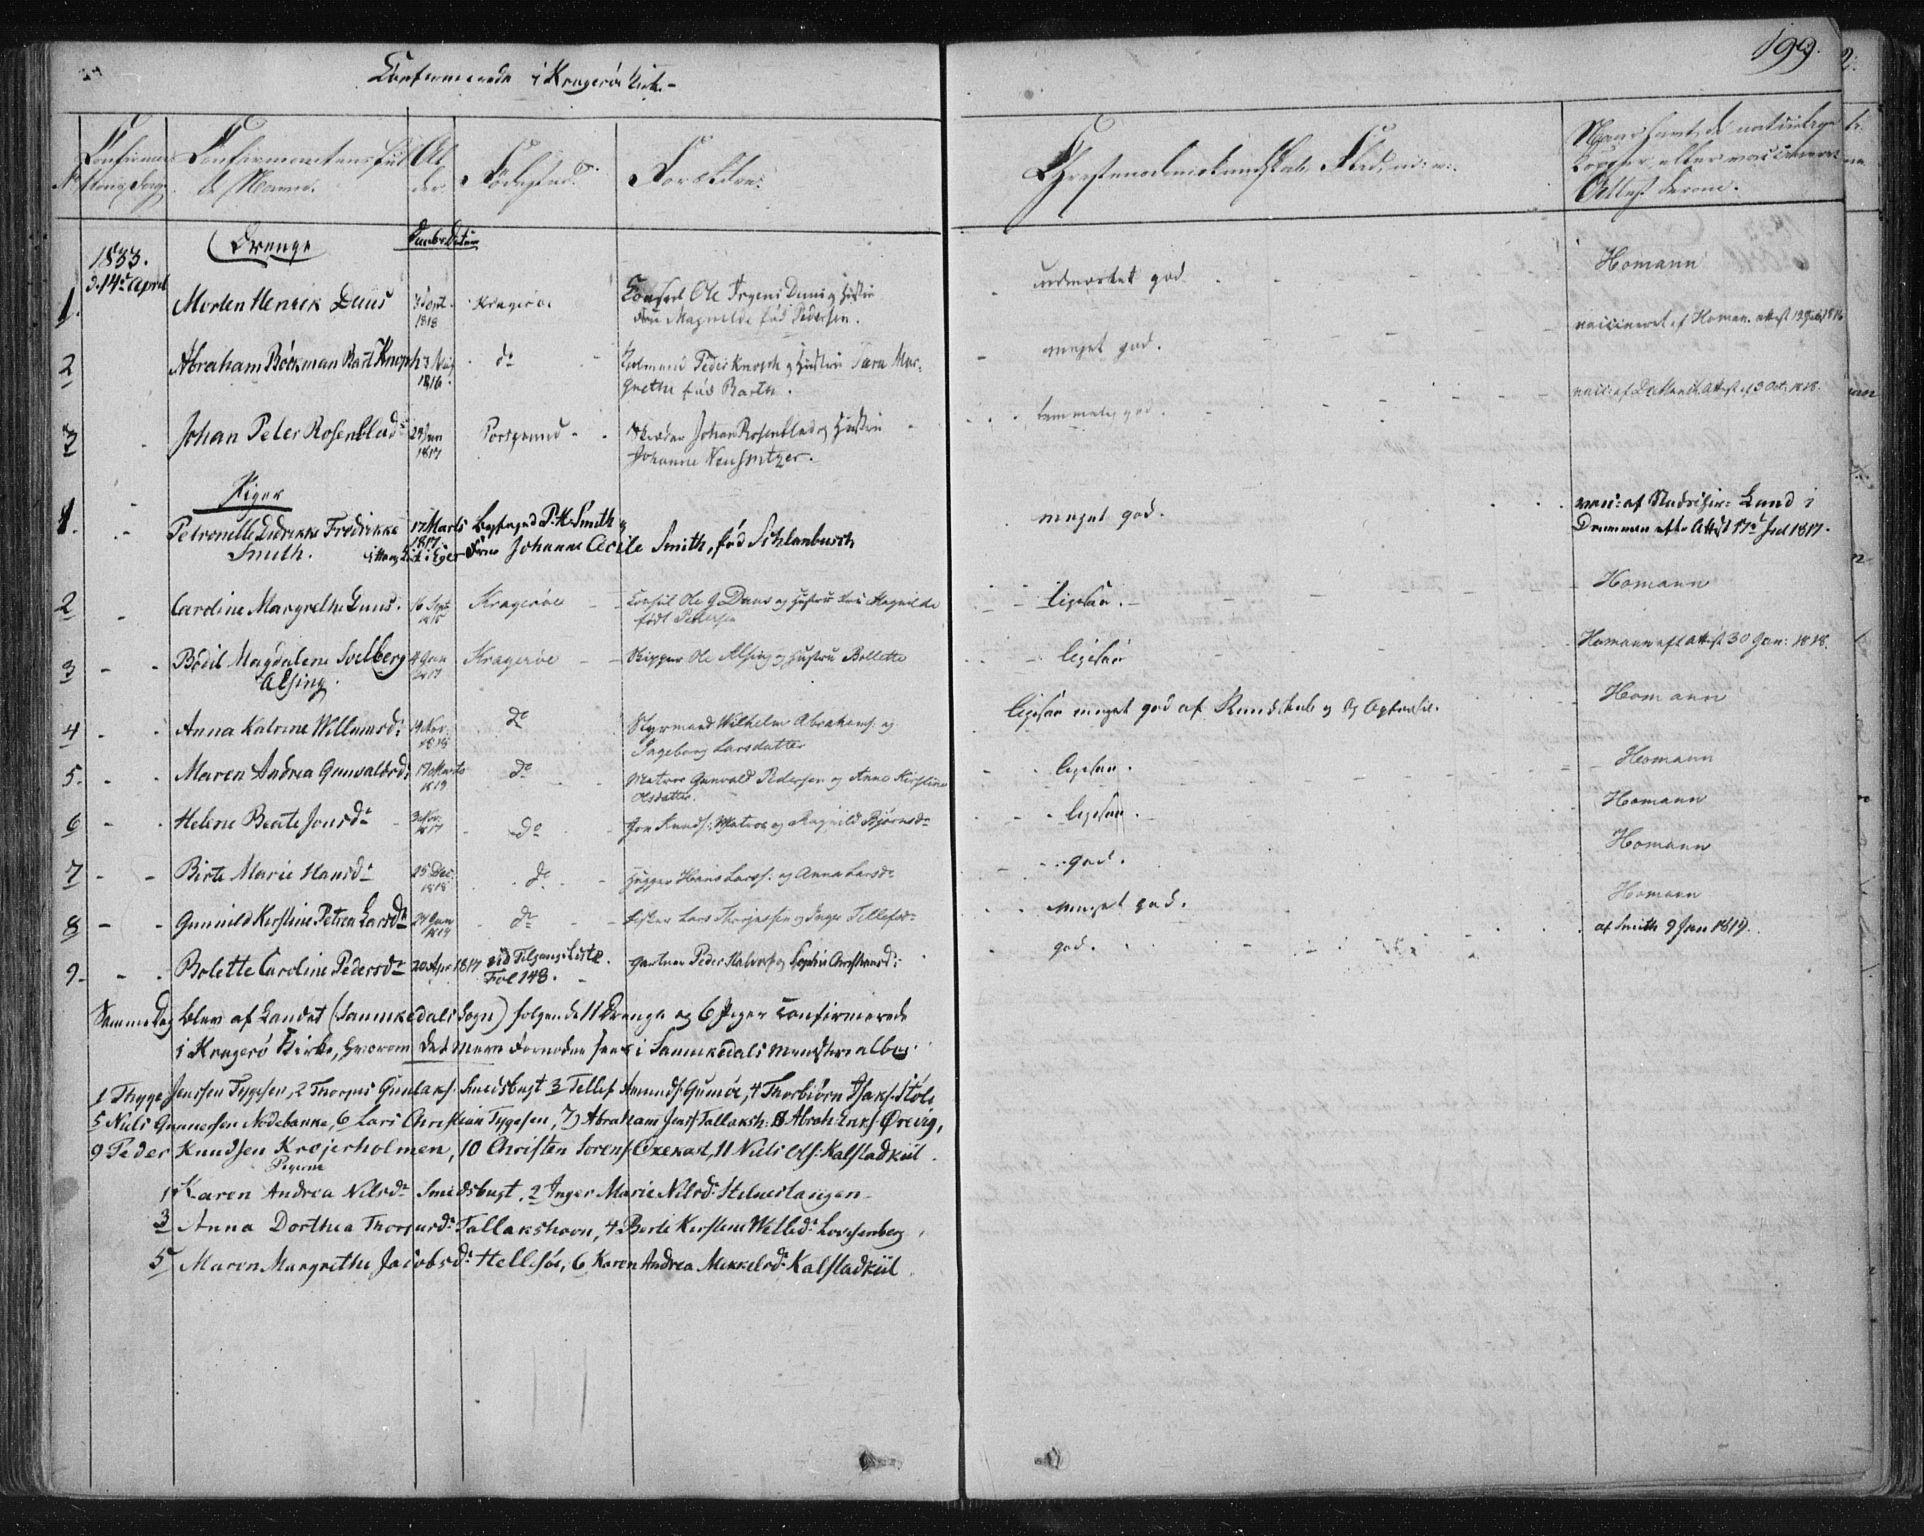 SAKO, Kragerø kirkebøker, F/Fa/L0005: Ministerialbok nr. 5, 1832-1847, s. 199